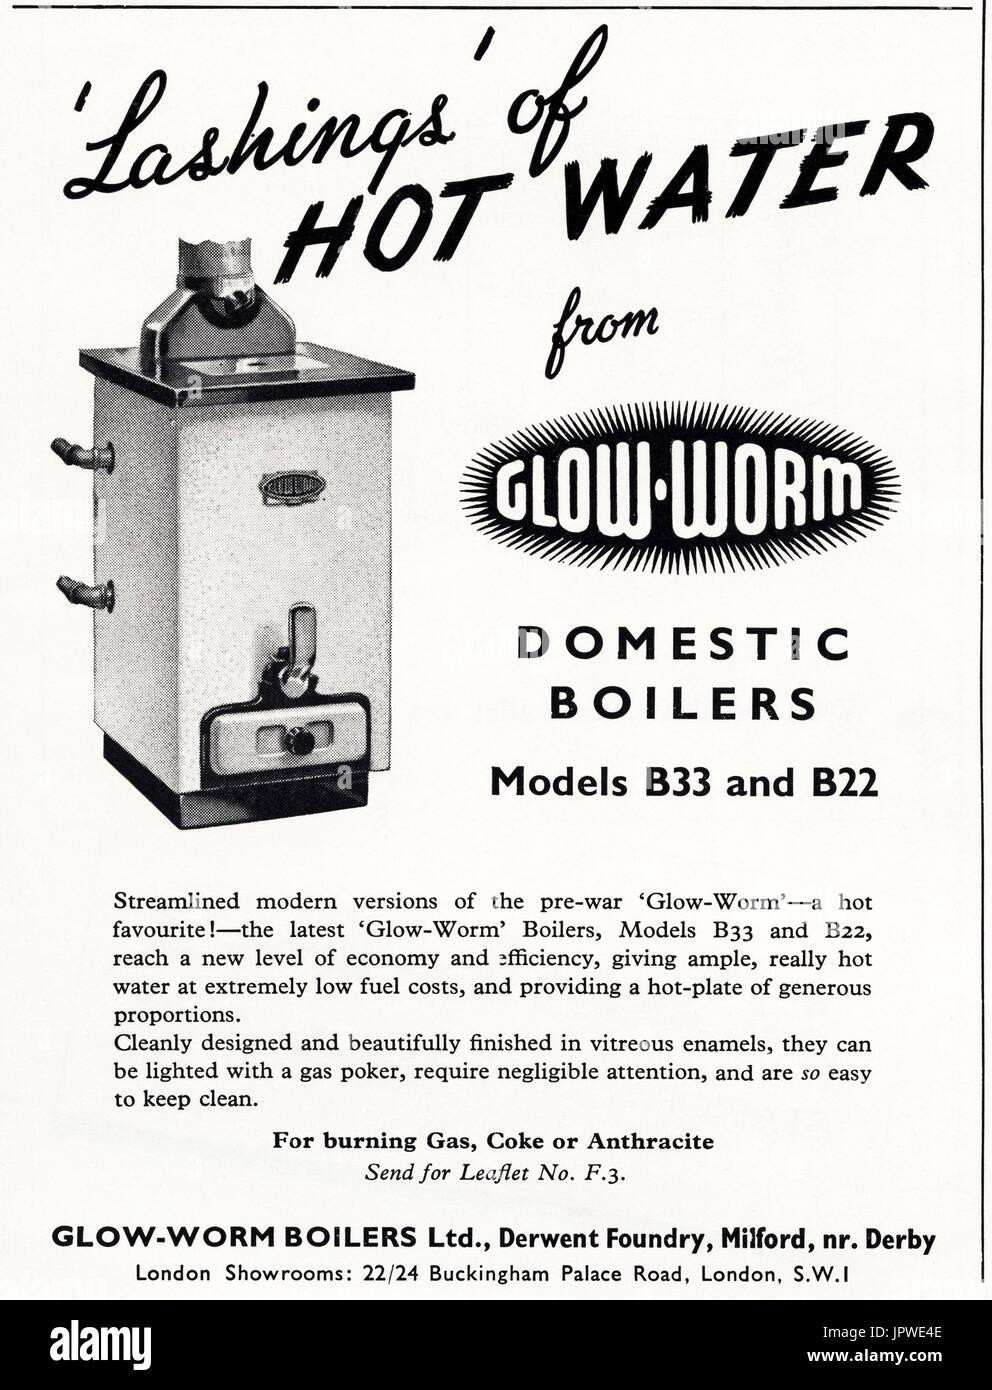 Water Boilers Stockfotos & Water Boilers Bilder - Alamy